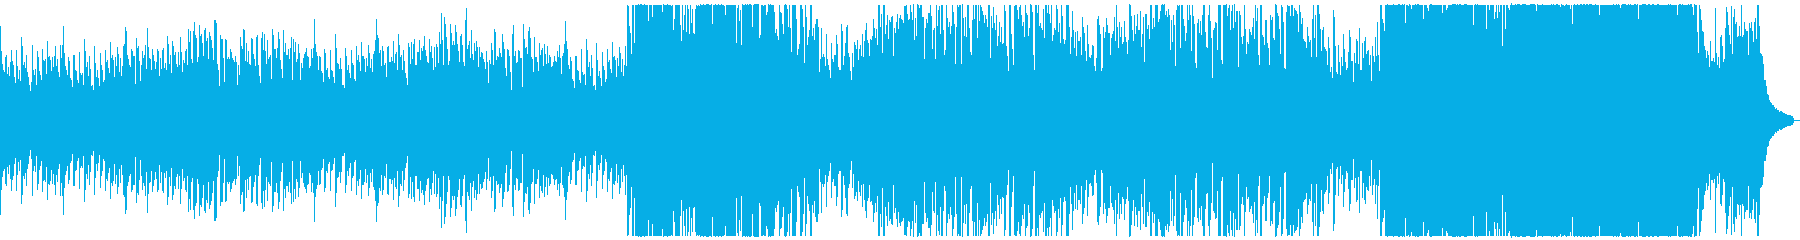 B U R N H O U S Eの再生済みの波形